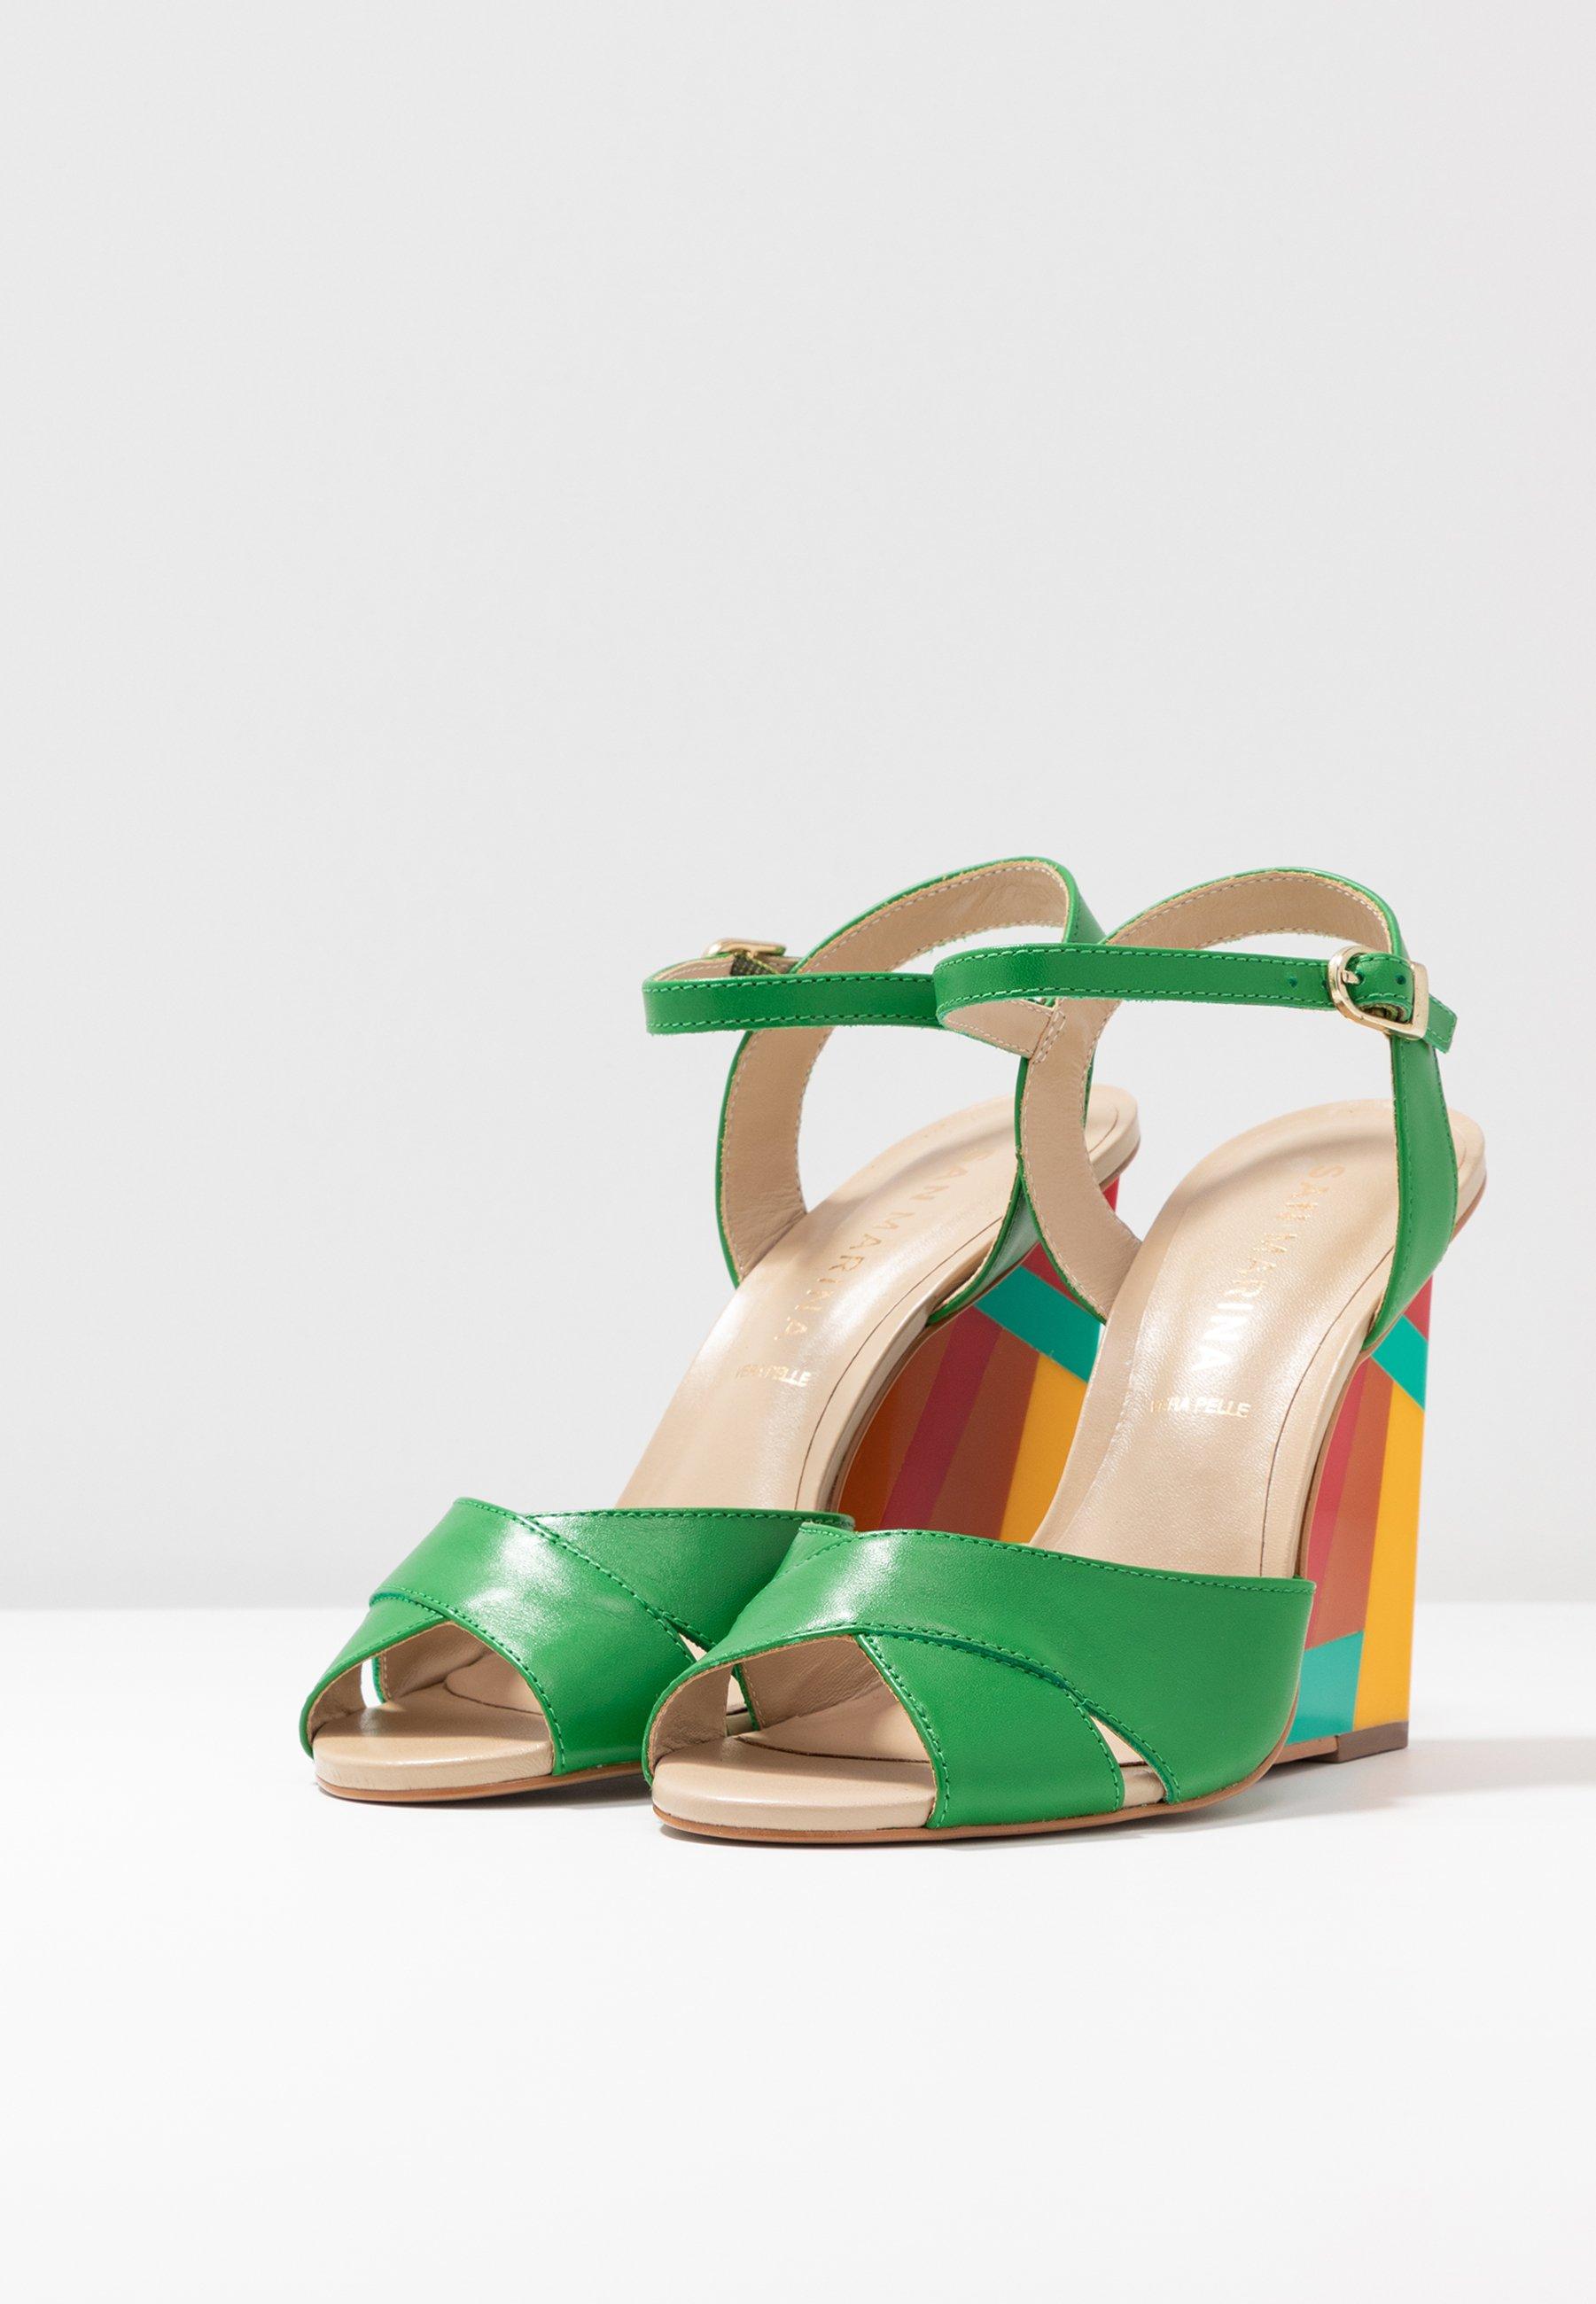 San Marina Vanini - High Heeled Sandals Menthe